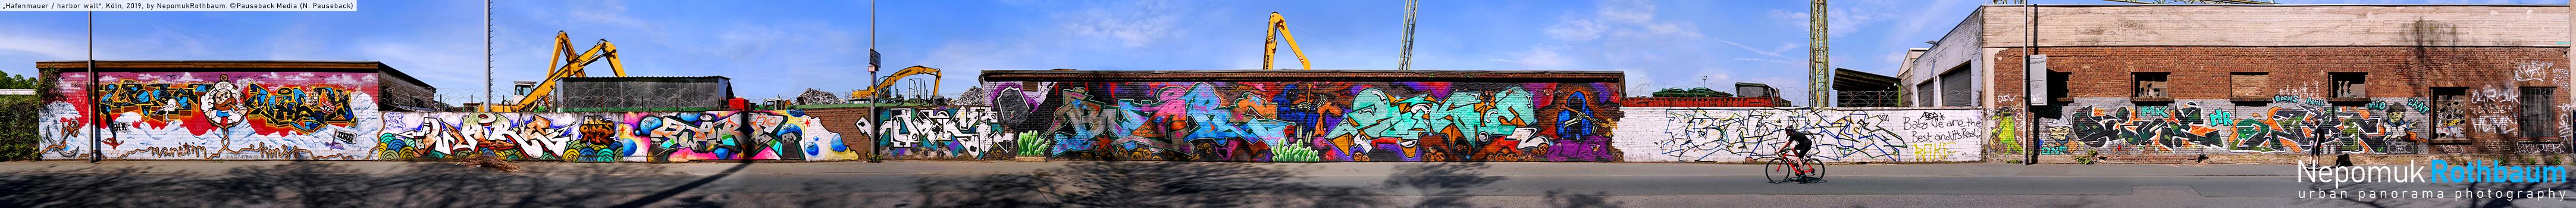 Hafenmauer / harbor wall, Köln 2019, by Nepomuk Rothbaum, © Pauseback Media (Nikolaus Pauseback) 2019